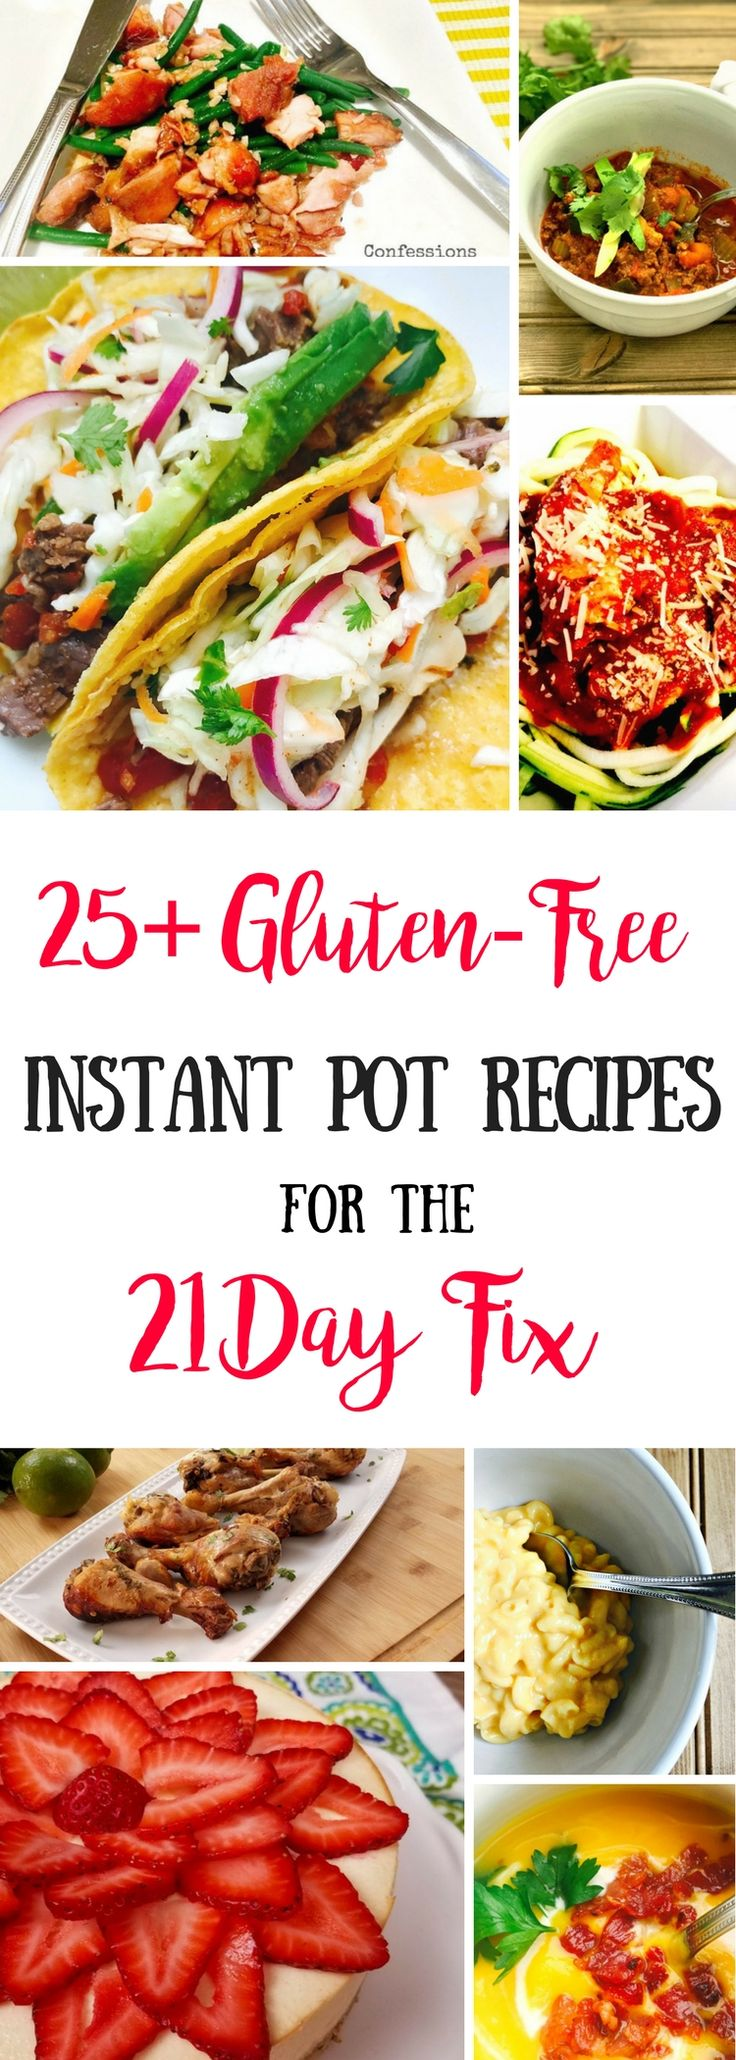 21 Day Fix Gluten Free Instant Pot Recipes